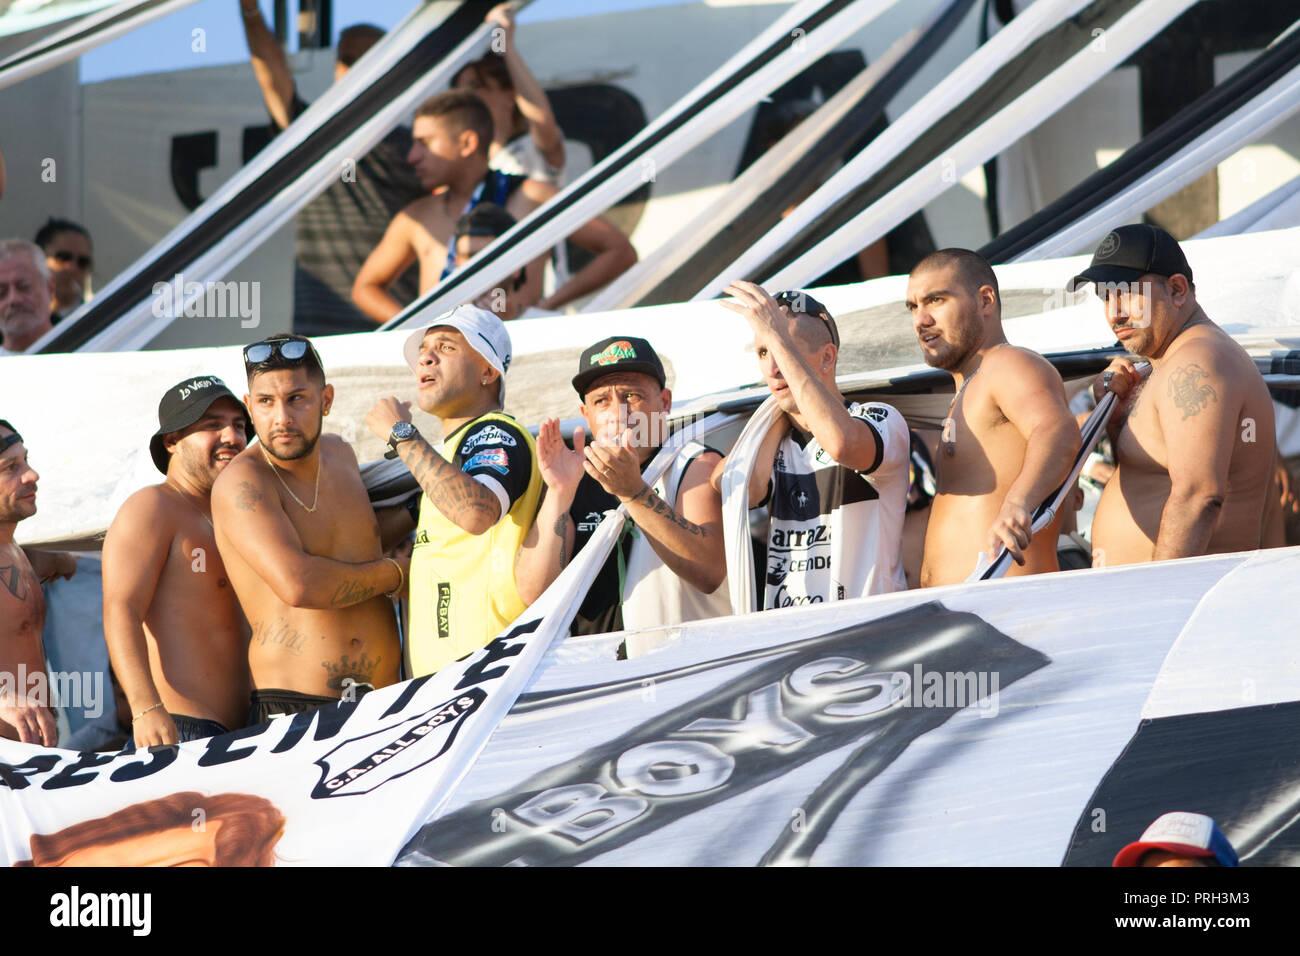 Members of 'La Barra de Muro' during a football match of All Boys. - Stock Image